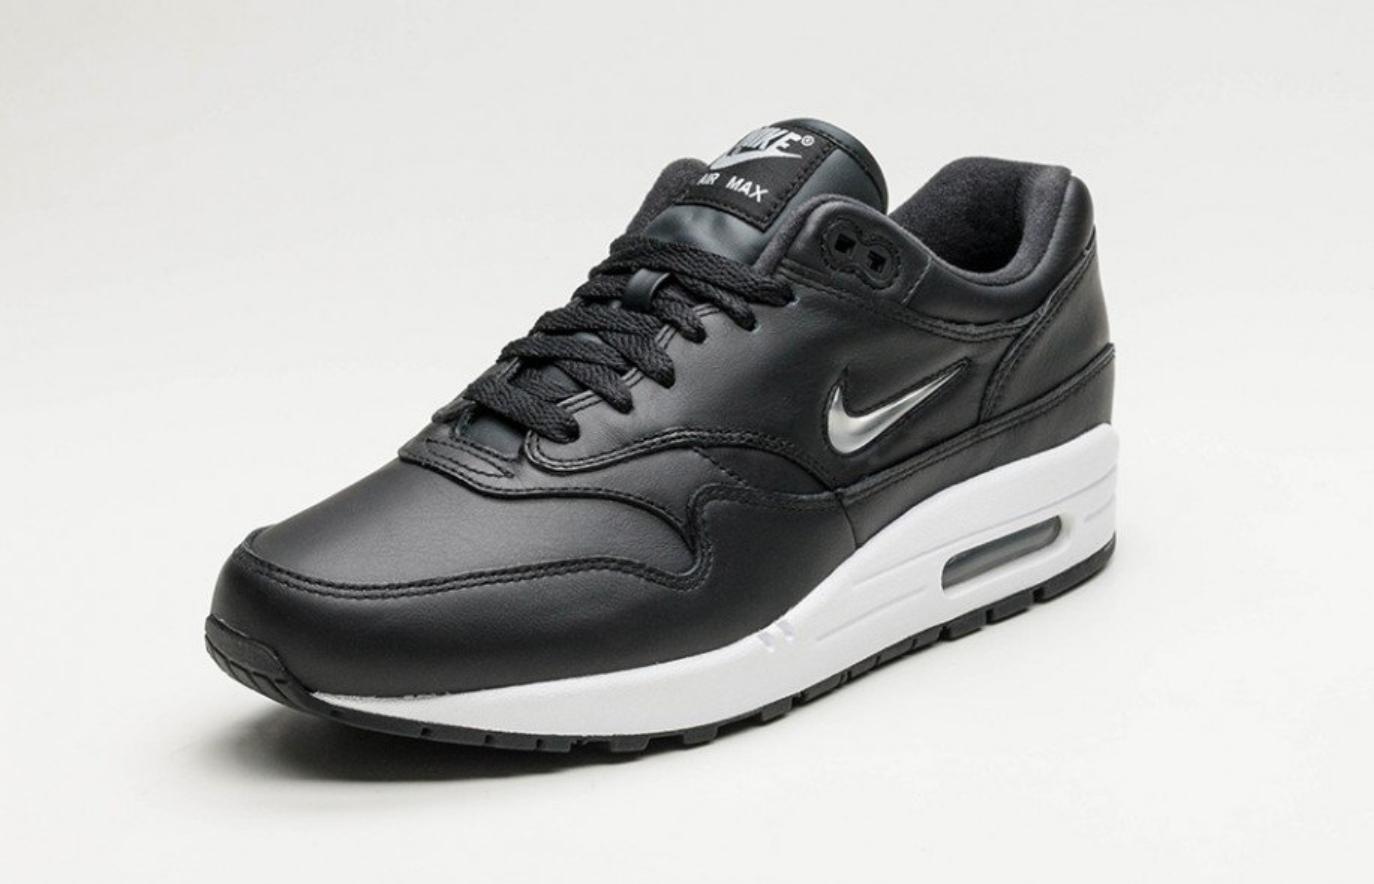 Black & Metallic Silver Cover The Next Nike Air Max 1